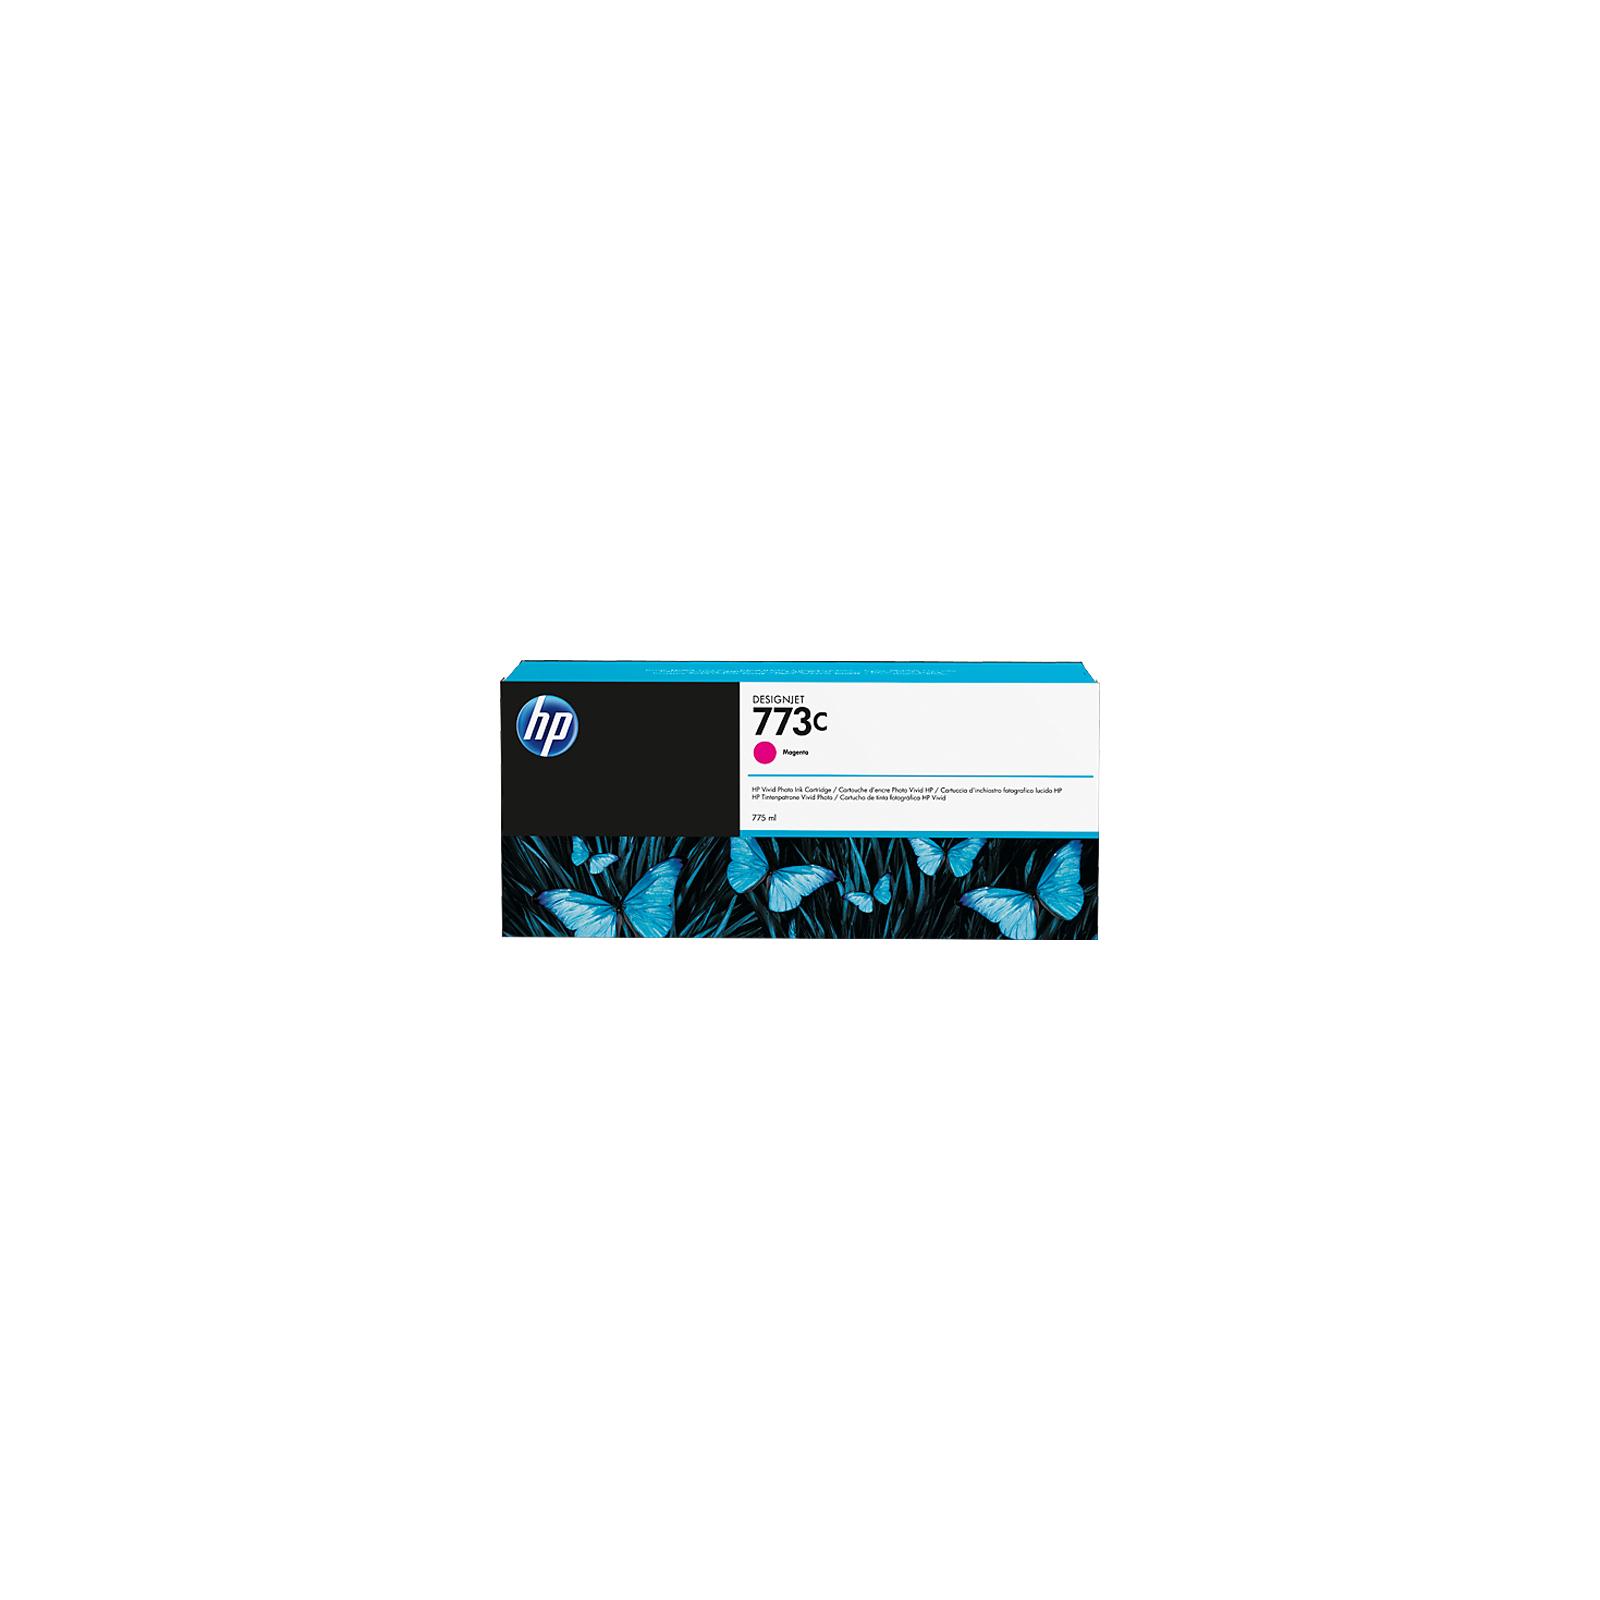 Картридж HP DJ No.773C Magenta DesignJet Ink Cartridge (C1Q39A)